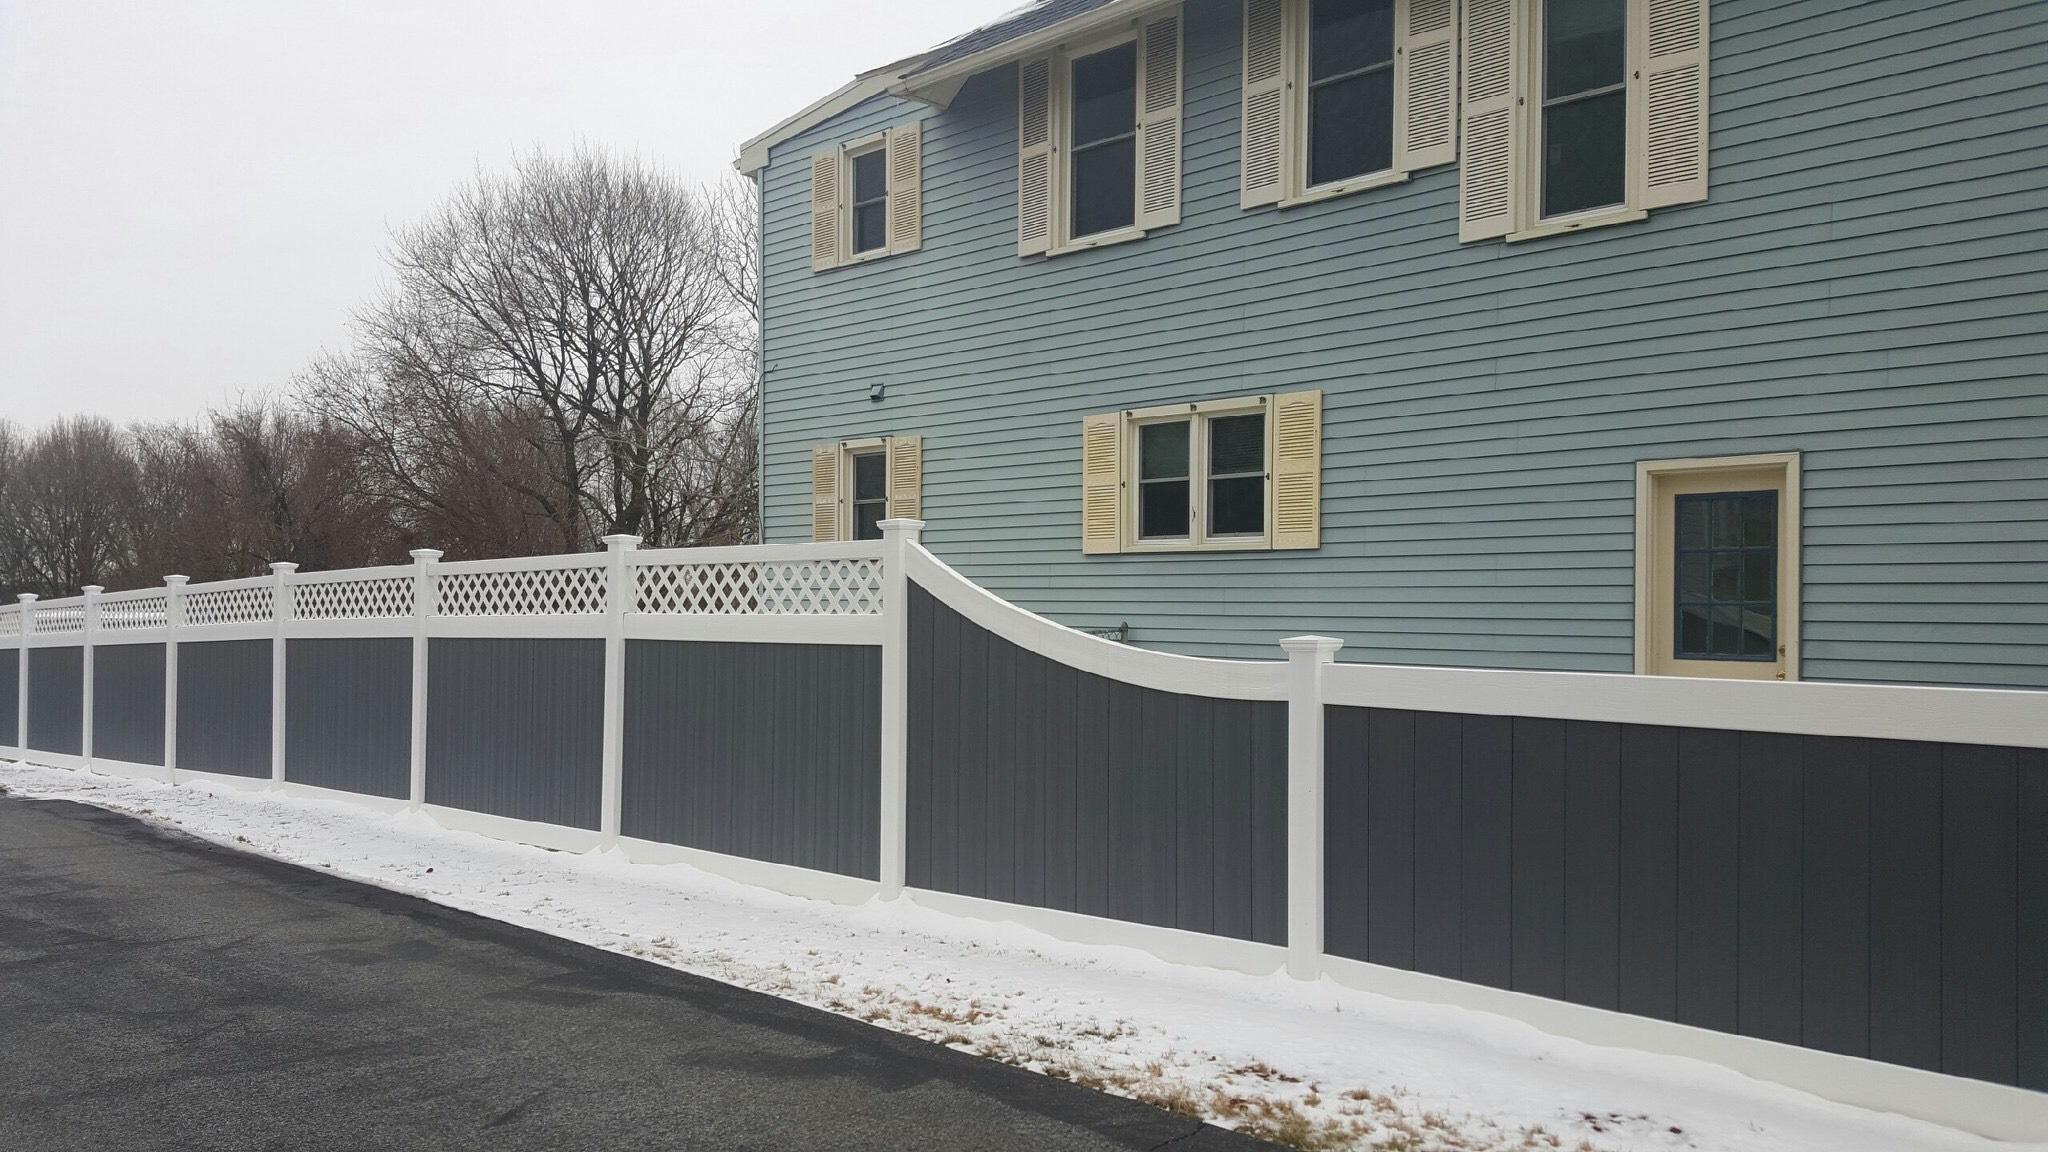 decorative vinyl fence with lattice board